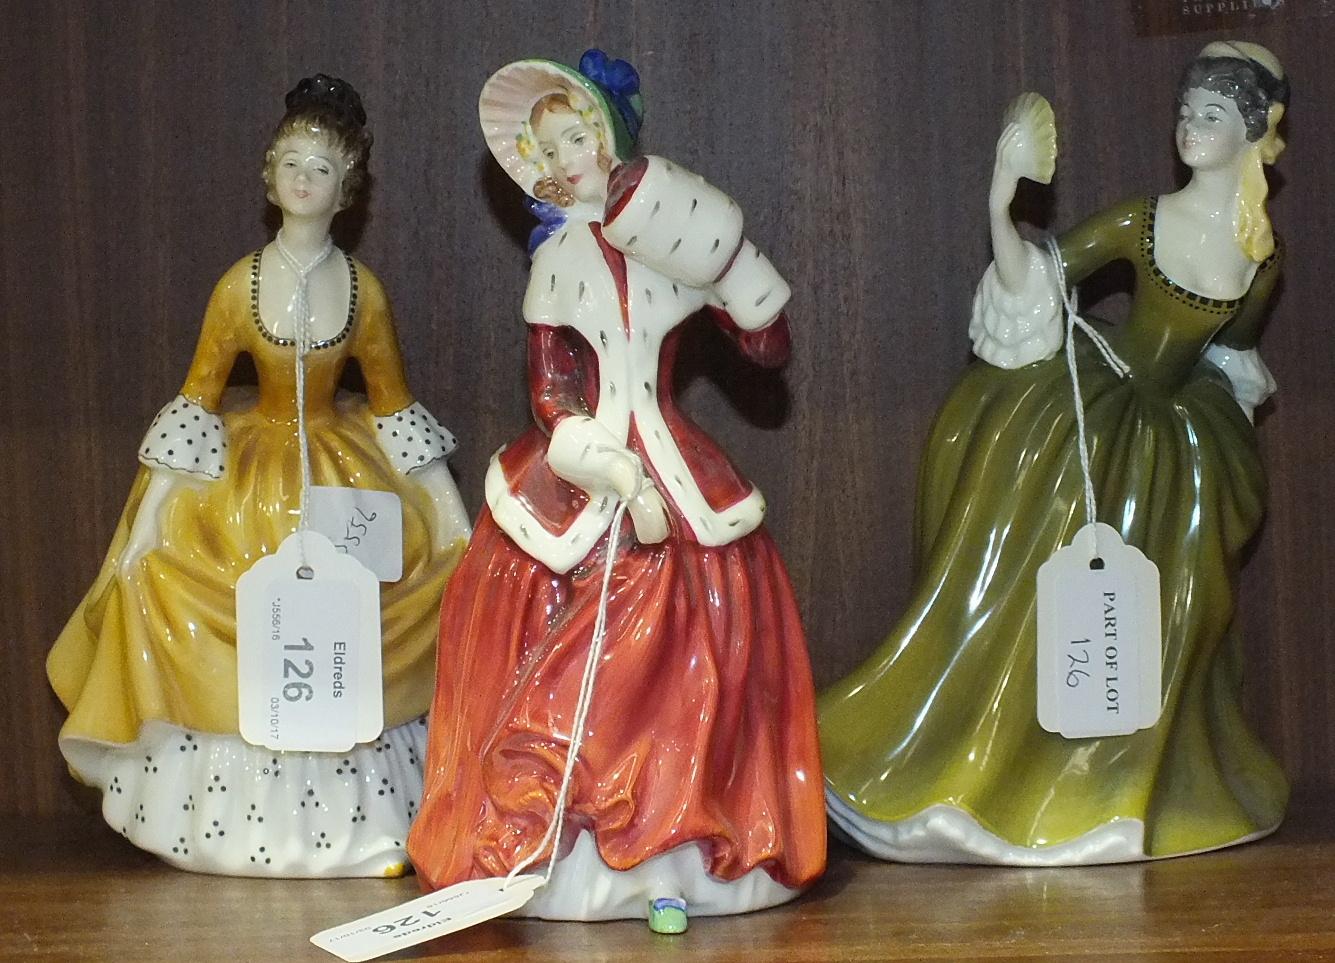 Lot 126 - Three Royal Doulton figurines, 'Coralie' HN2307, 18cm, 'Simone' HN2378, 18.5cm and 'Christmas